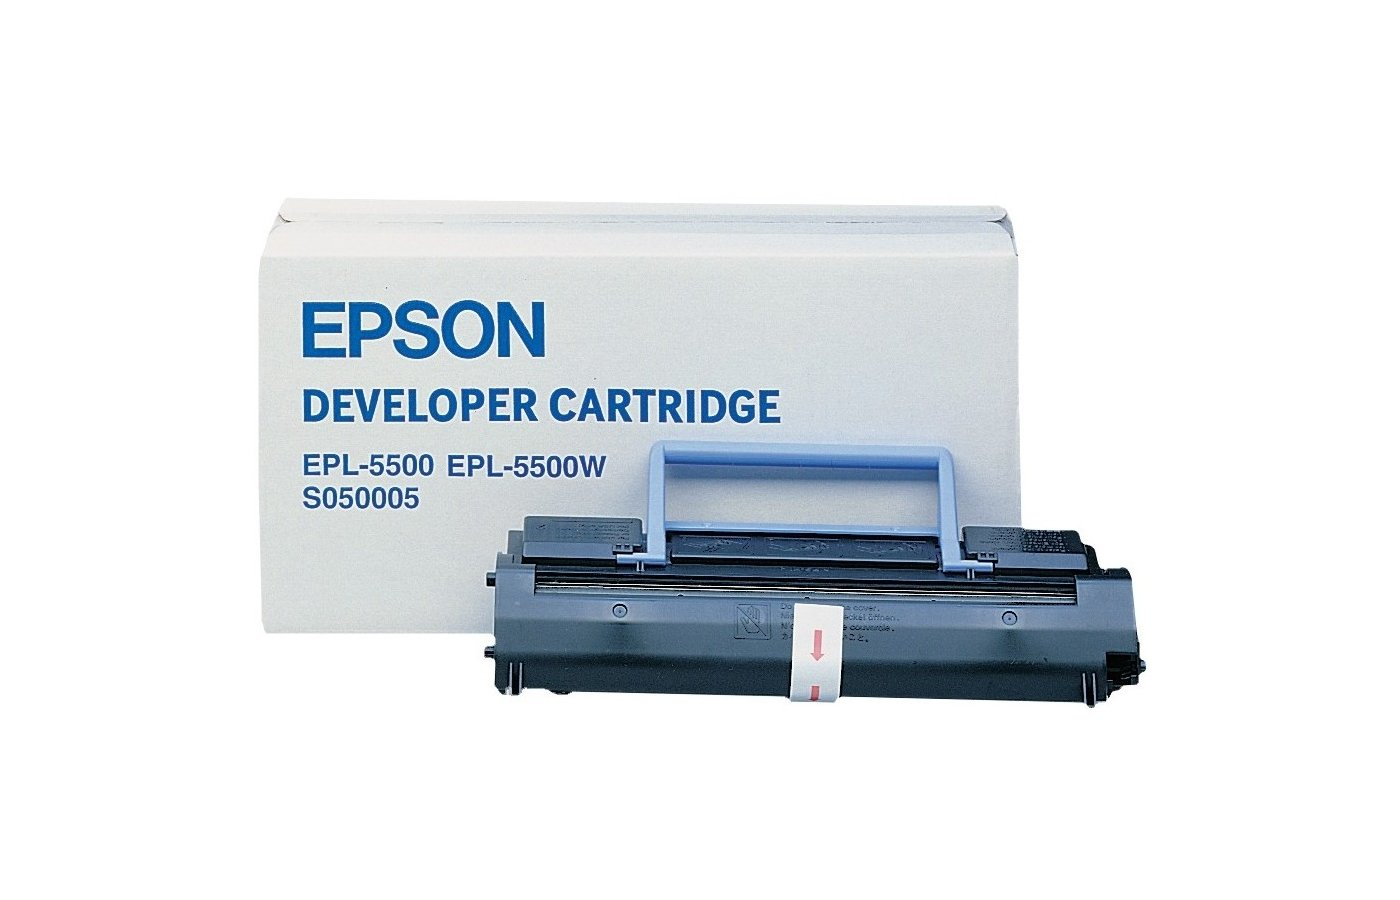 Картридж лазерный Epson C13S050005 Development картридж для EPL 5500